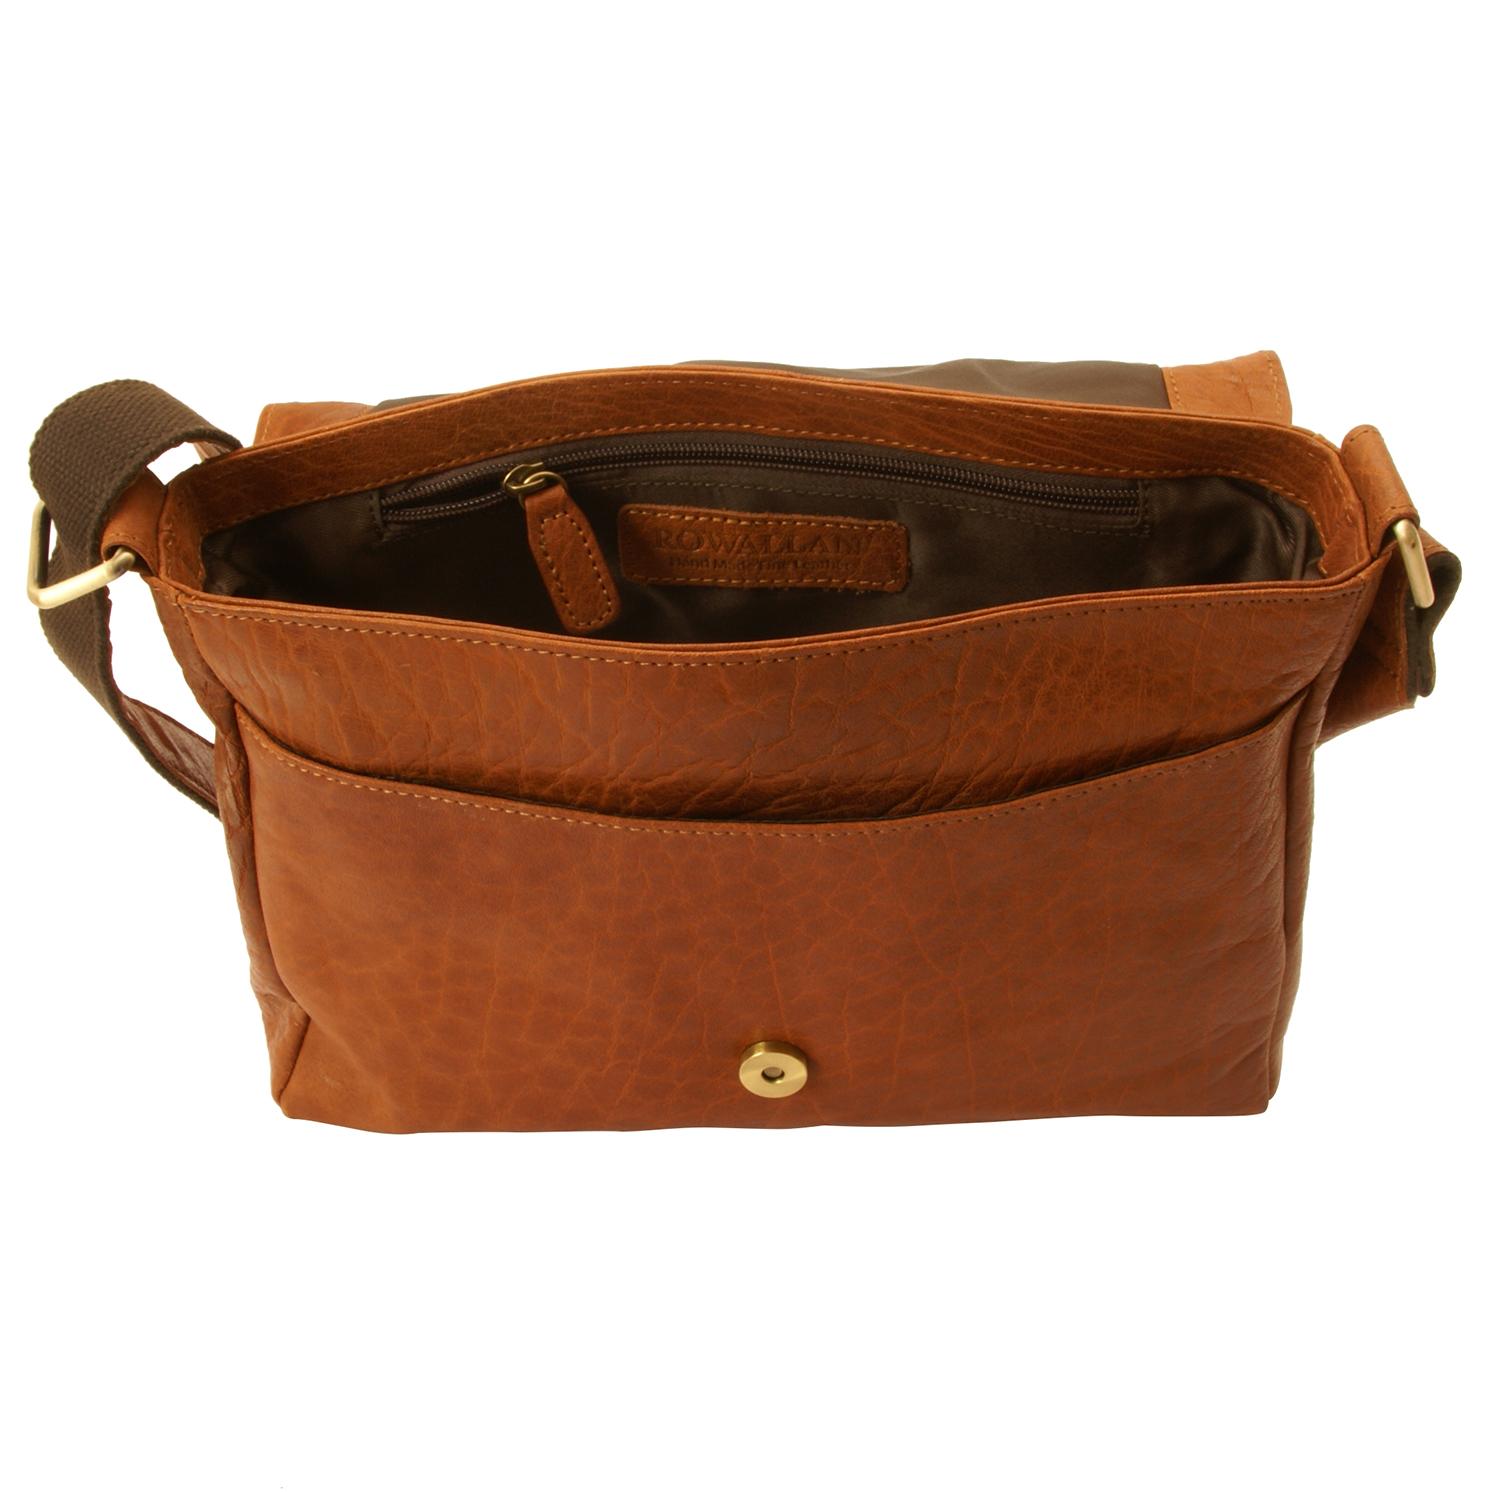 Rowallan – Tan Veneer East/West Front Flap Messenger Bag in Buffalo Leather